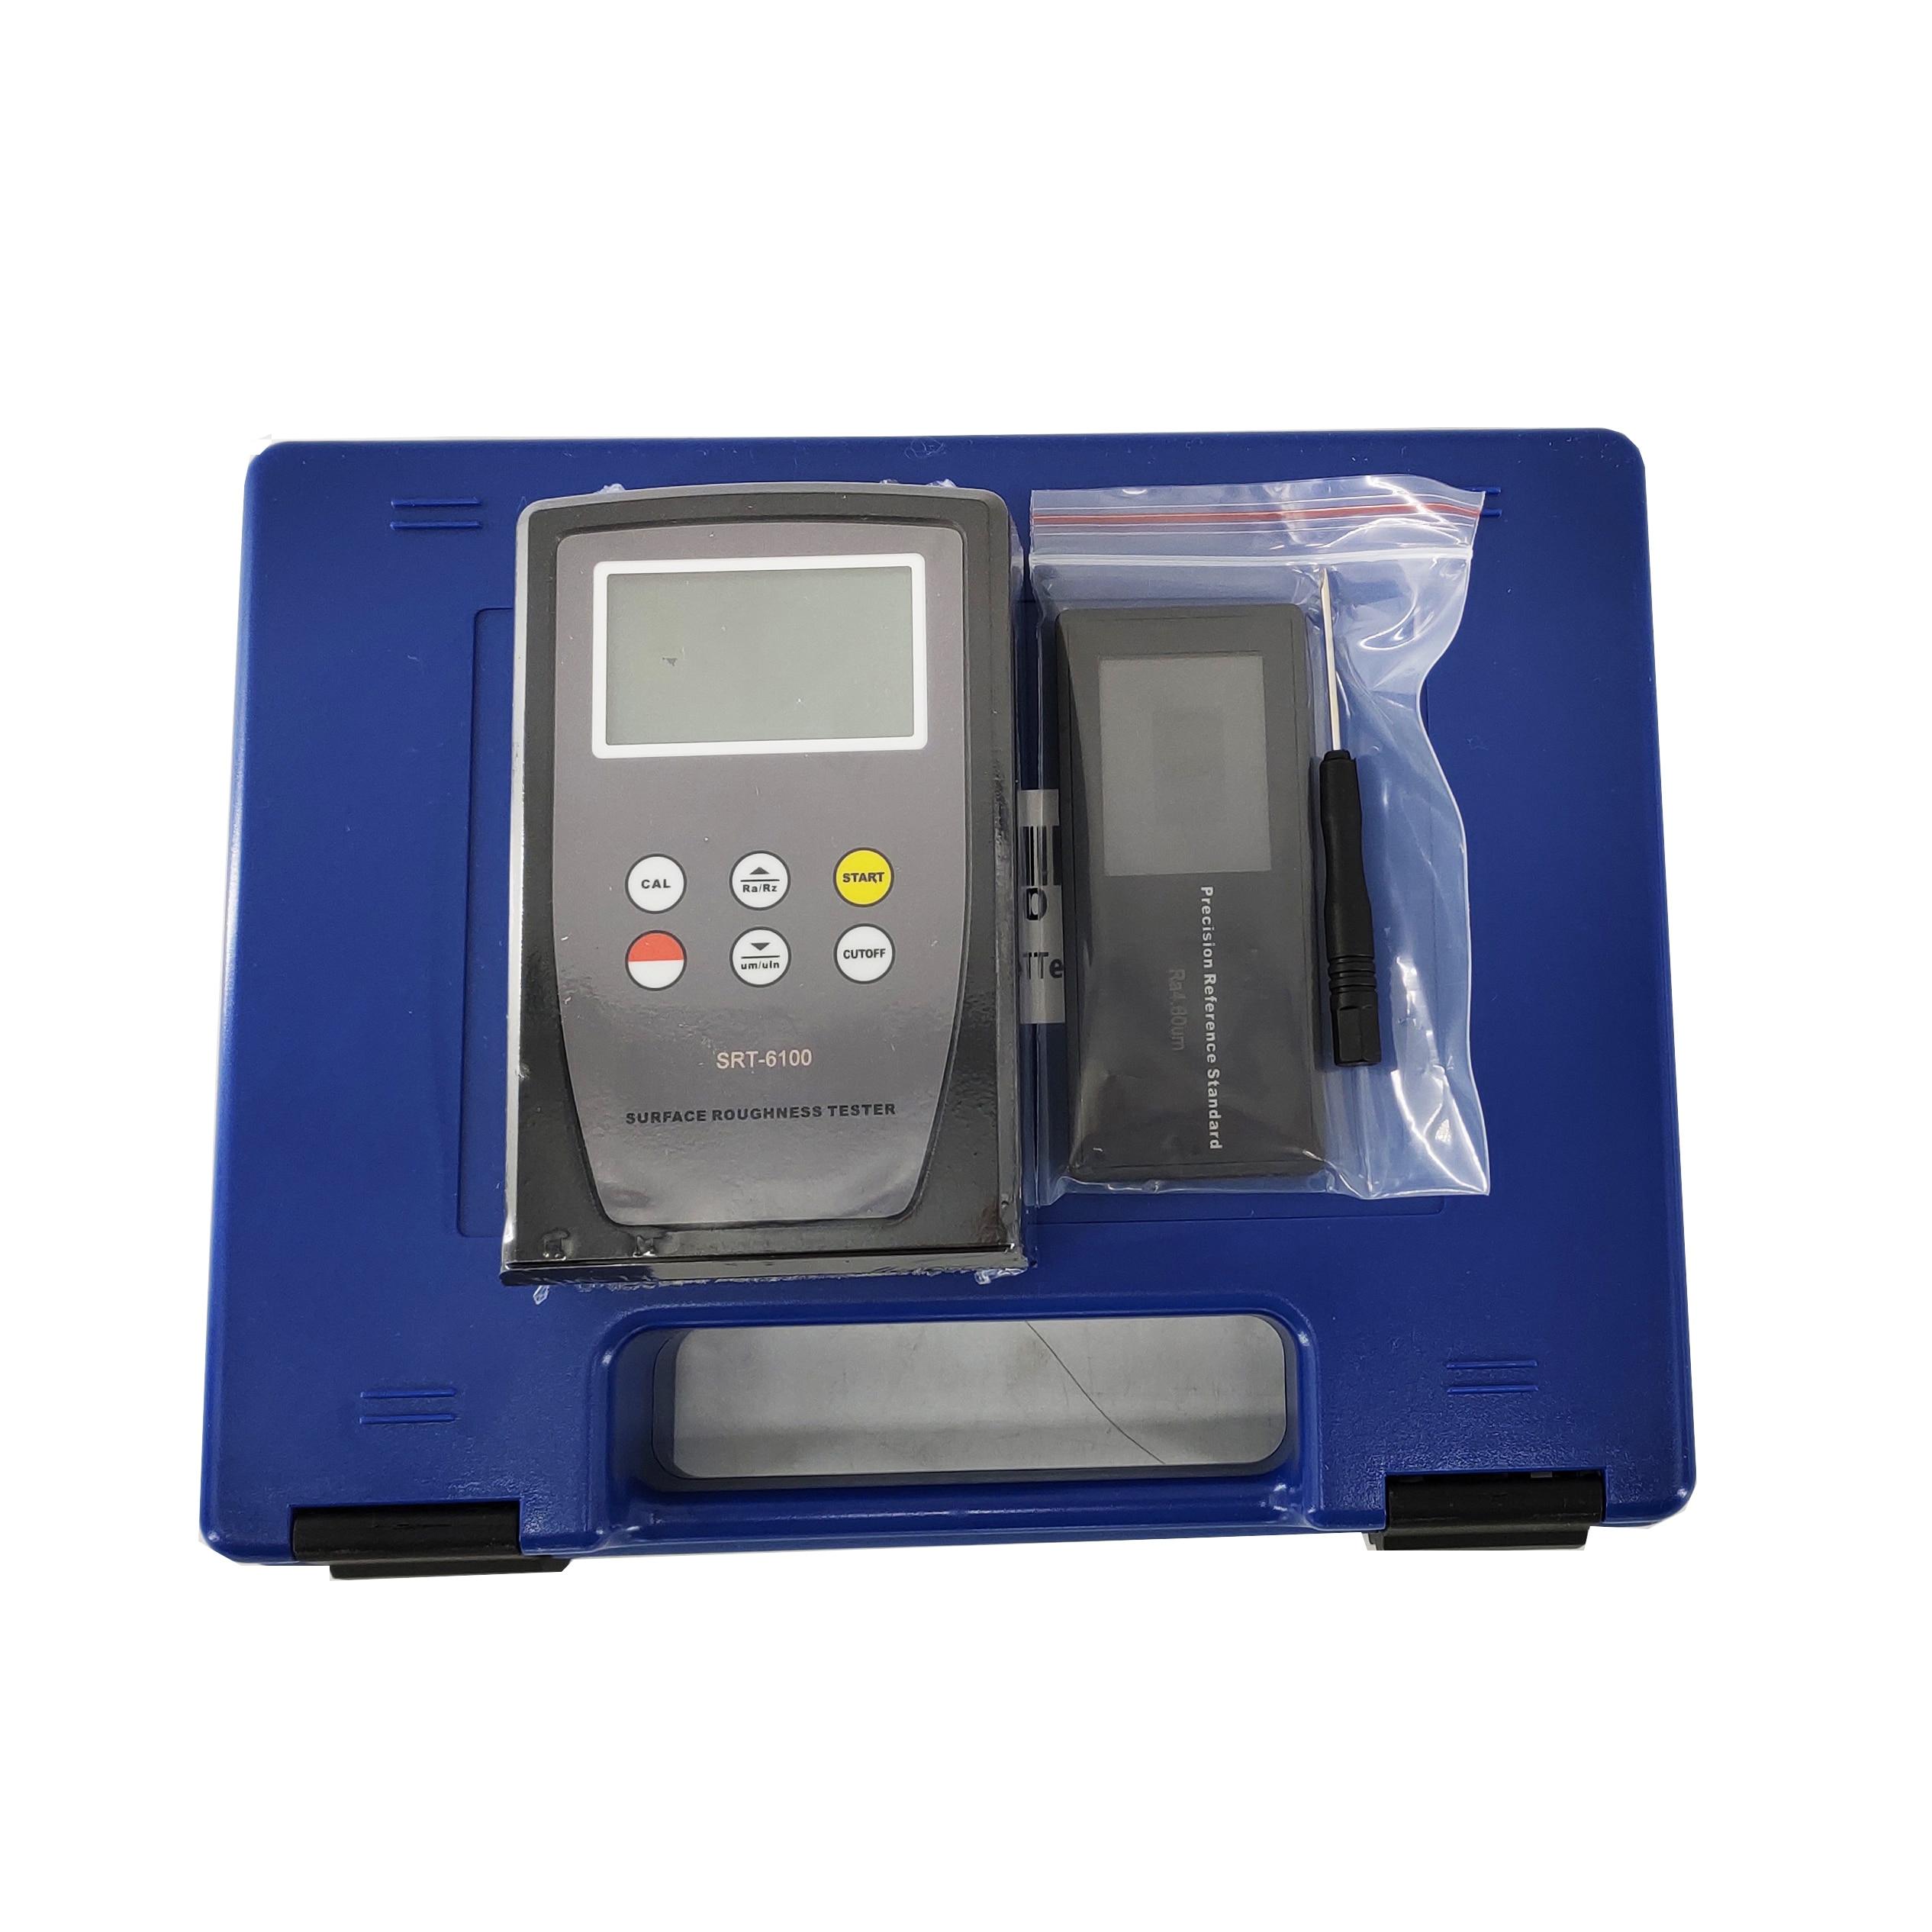 Ra Rz معلمات قياس أداة قياس خشونة الأسطح السعر مع SRT-6100 الرقمية LCD لوح التزلج مقياس بروفيلوميتر الشخصي